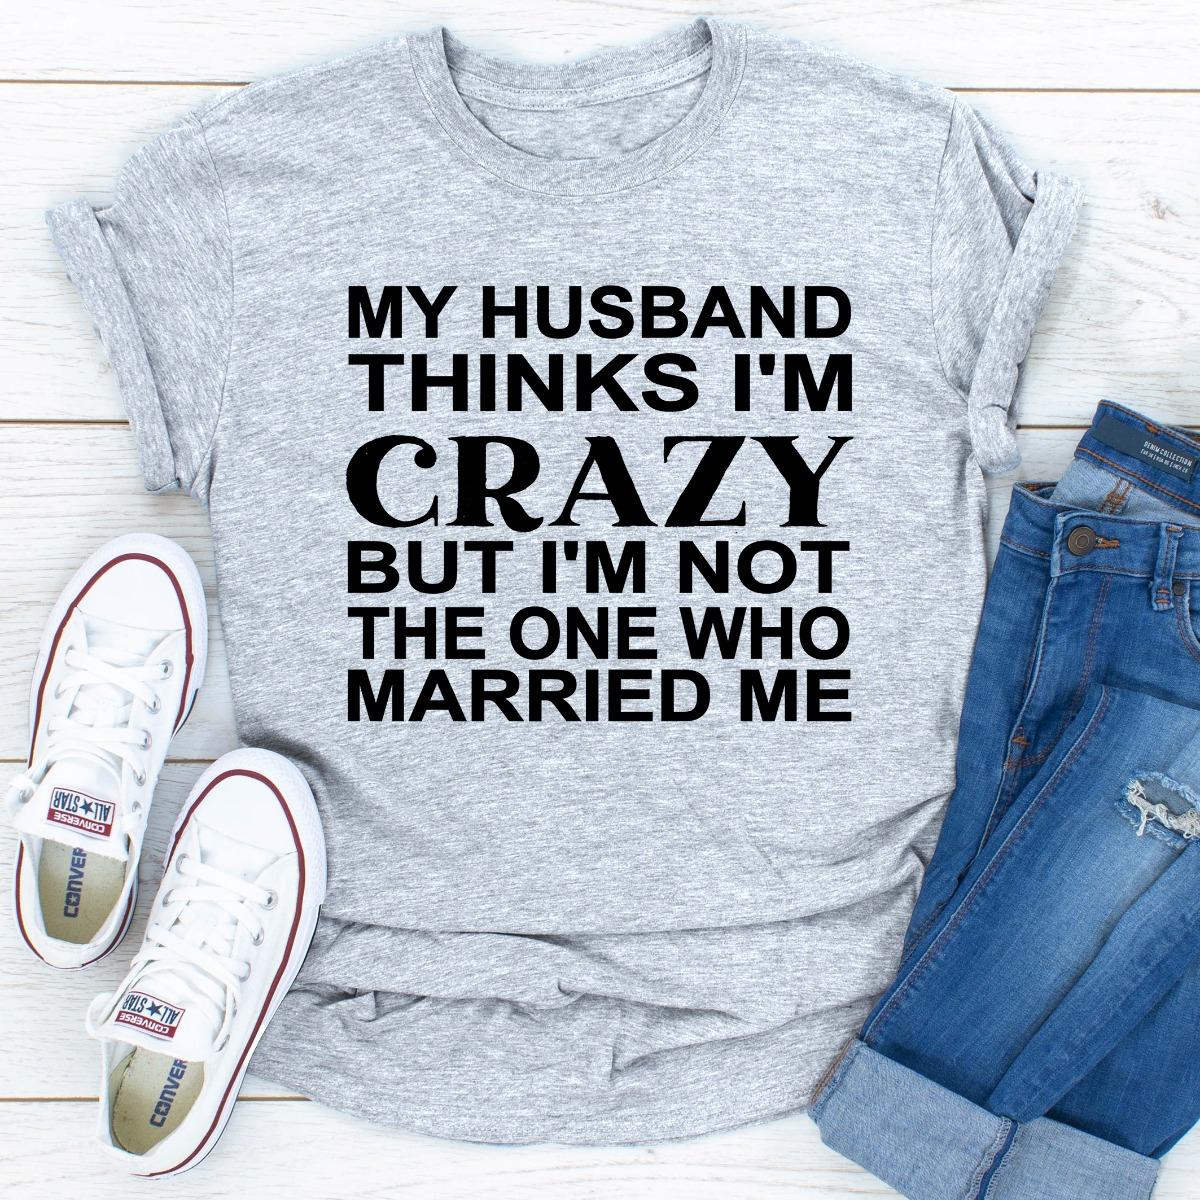 My Husband Thinks I'm Crazy (Sport Grey / Xl)